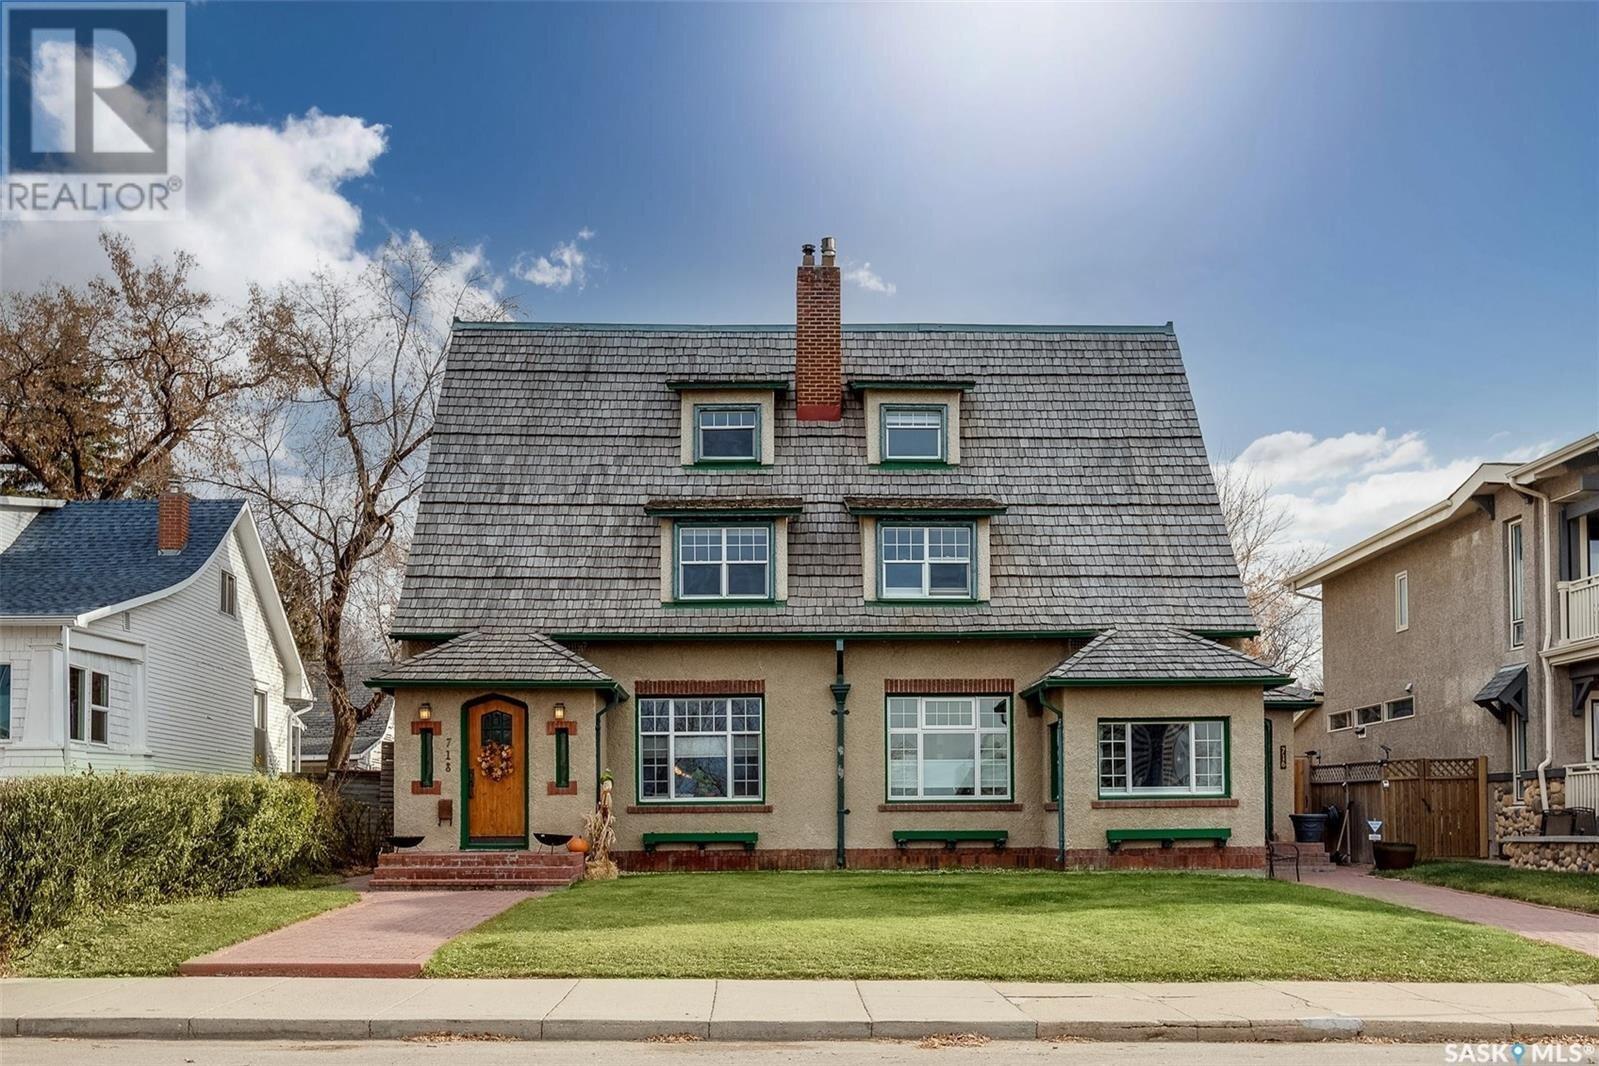 House for sale at 718 Saskatchewan Cres E Saskatoon Saskatchewan - MLS: SK819468